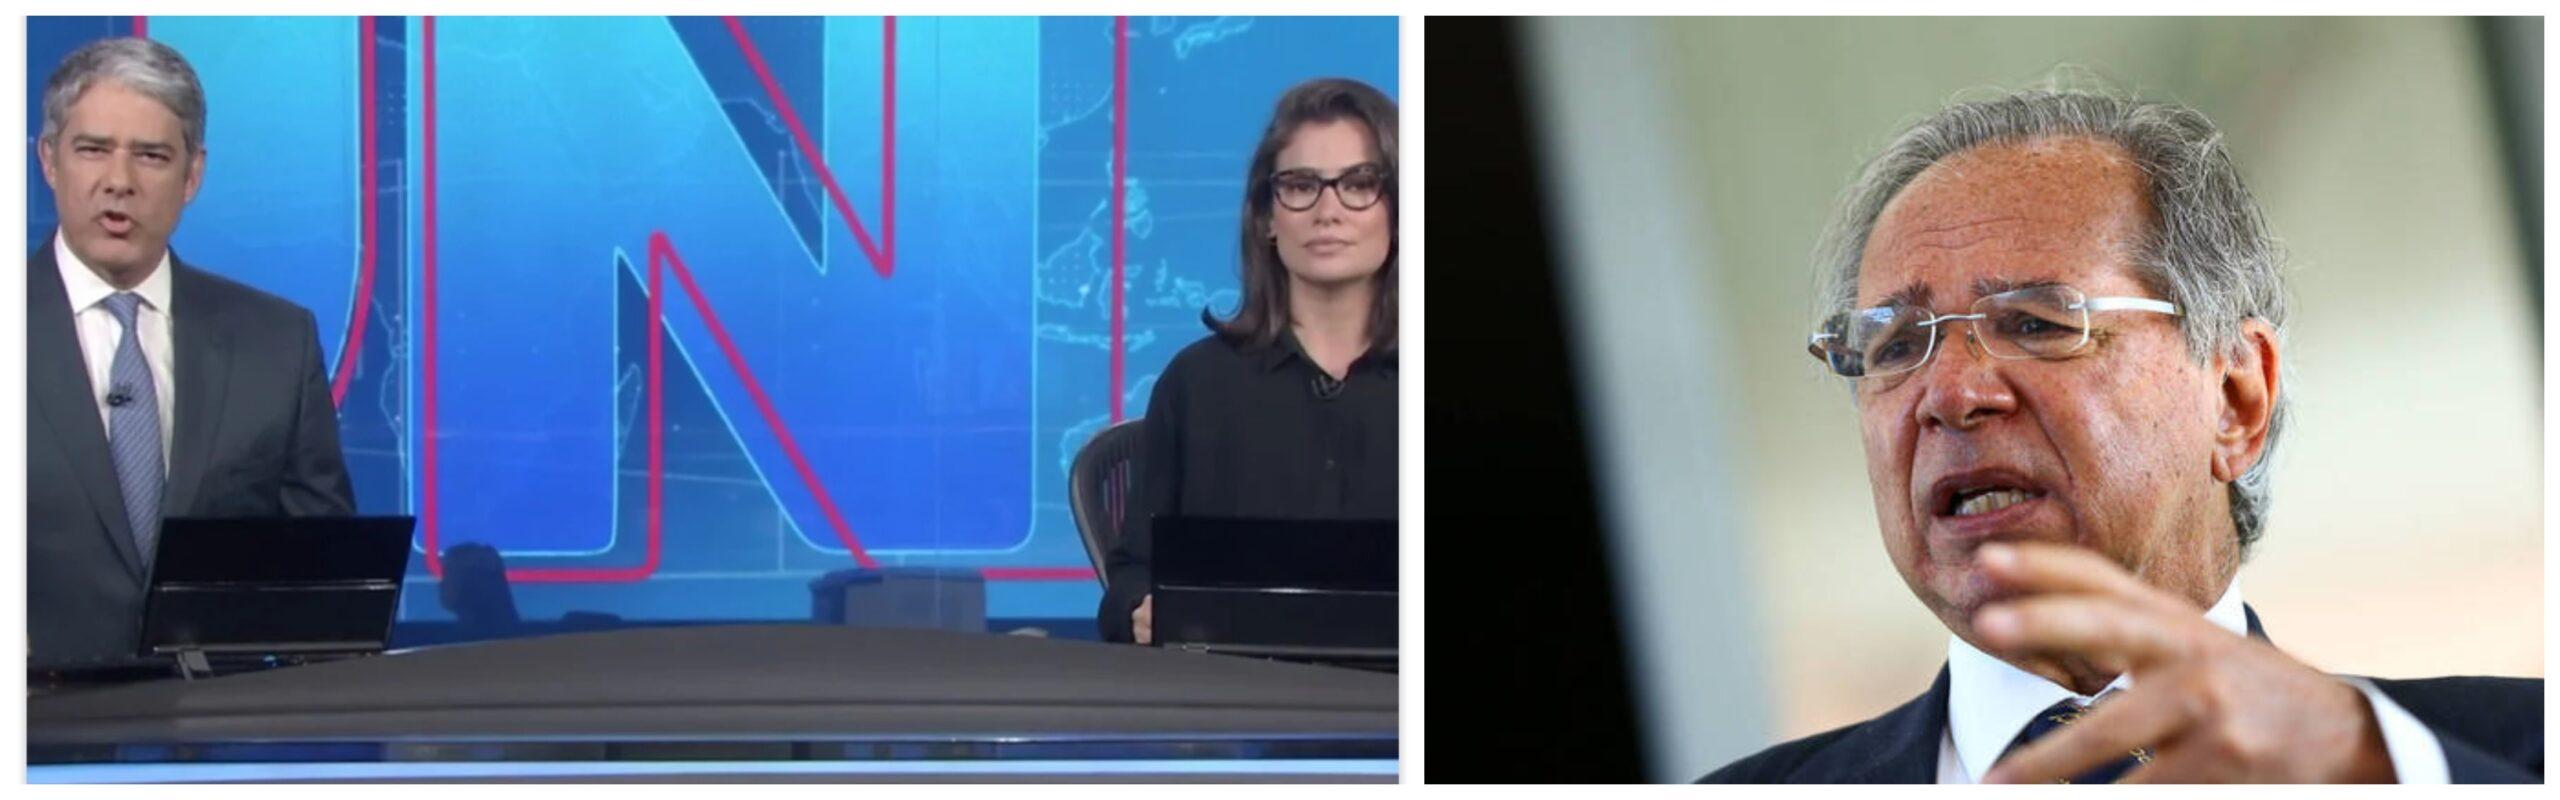 Eliara Santana: Absurda blindagem do JN ao ministro Paulo Guedes e a offshore em paraíso fiscal